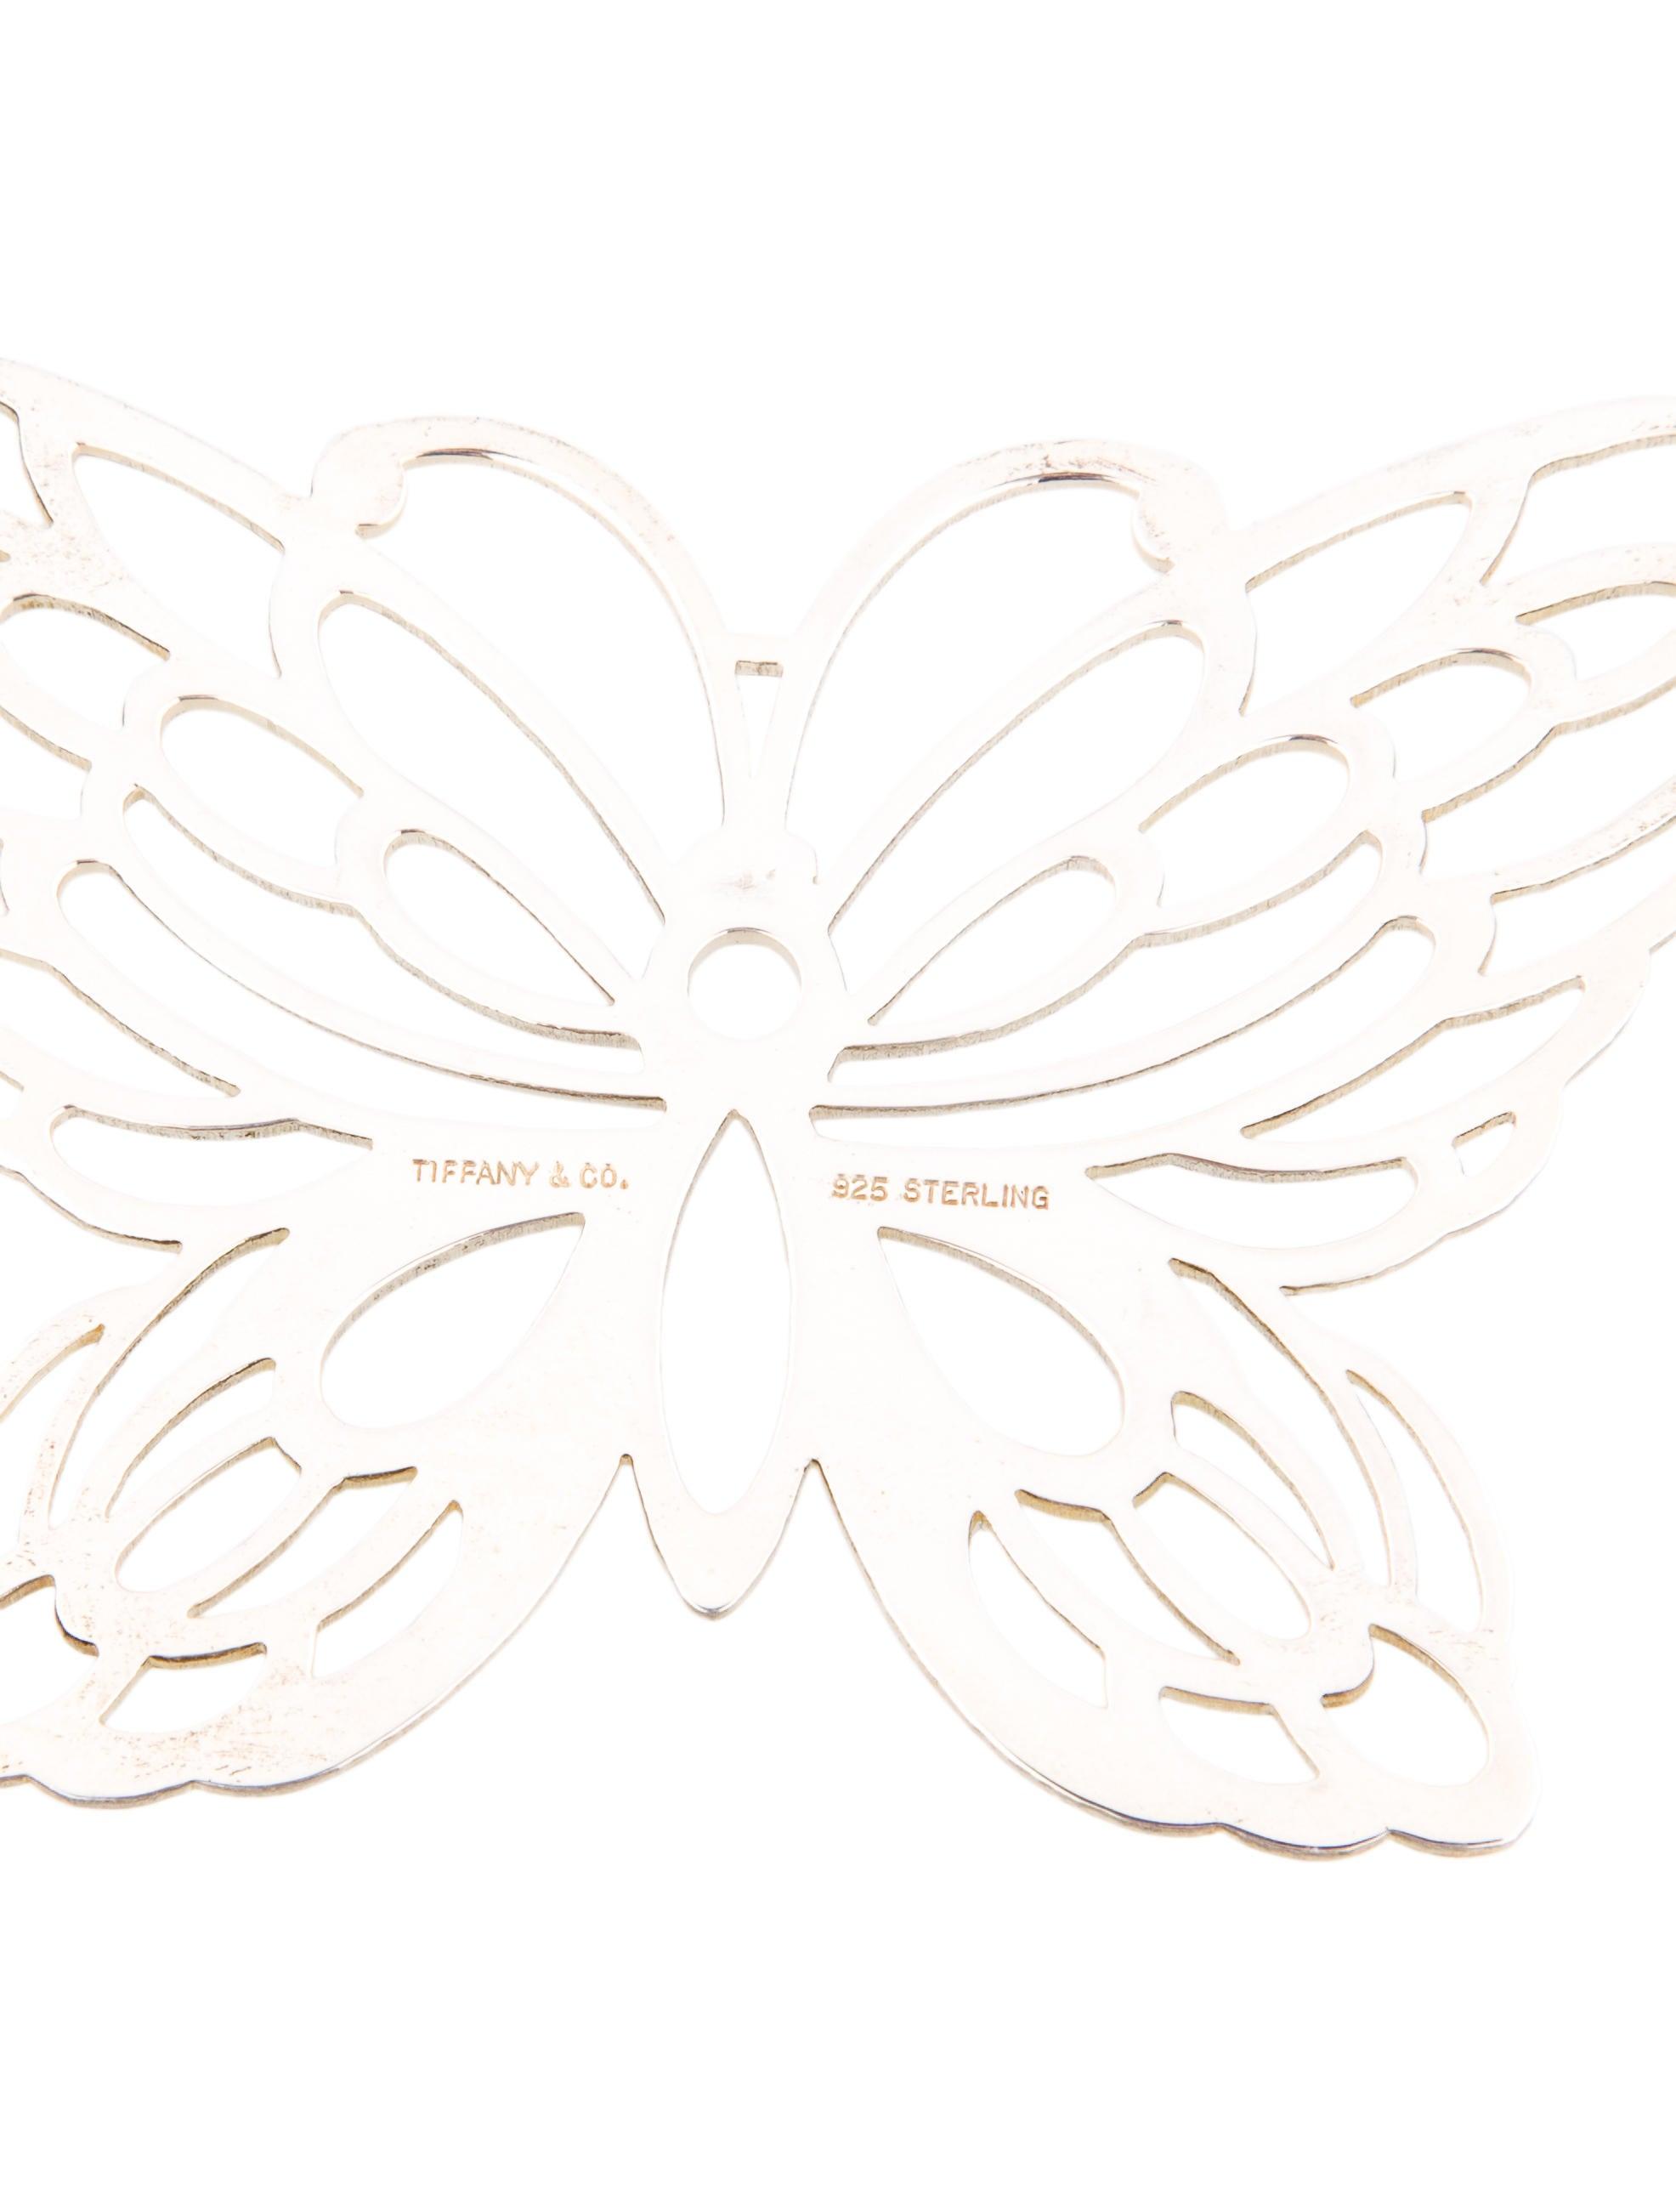 Tiffany co sterling silver ornament decor and for Artistic accents genuine silver decoration